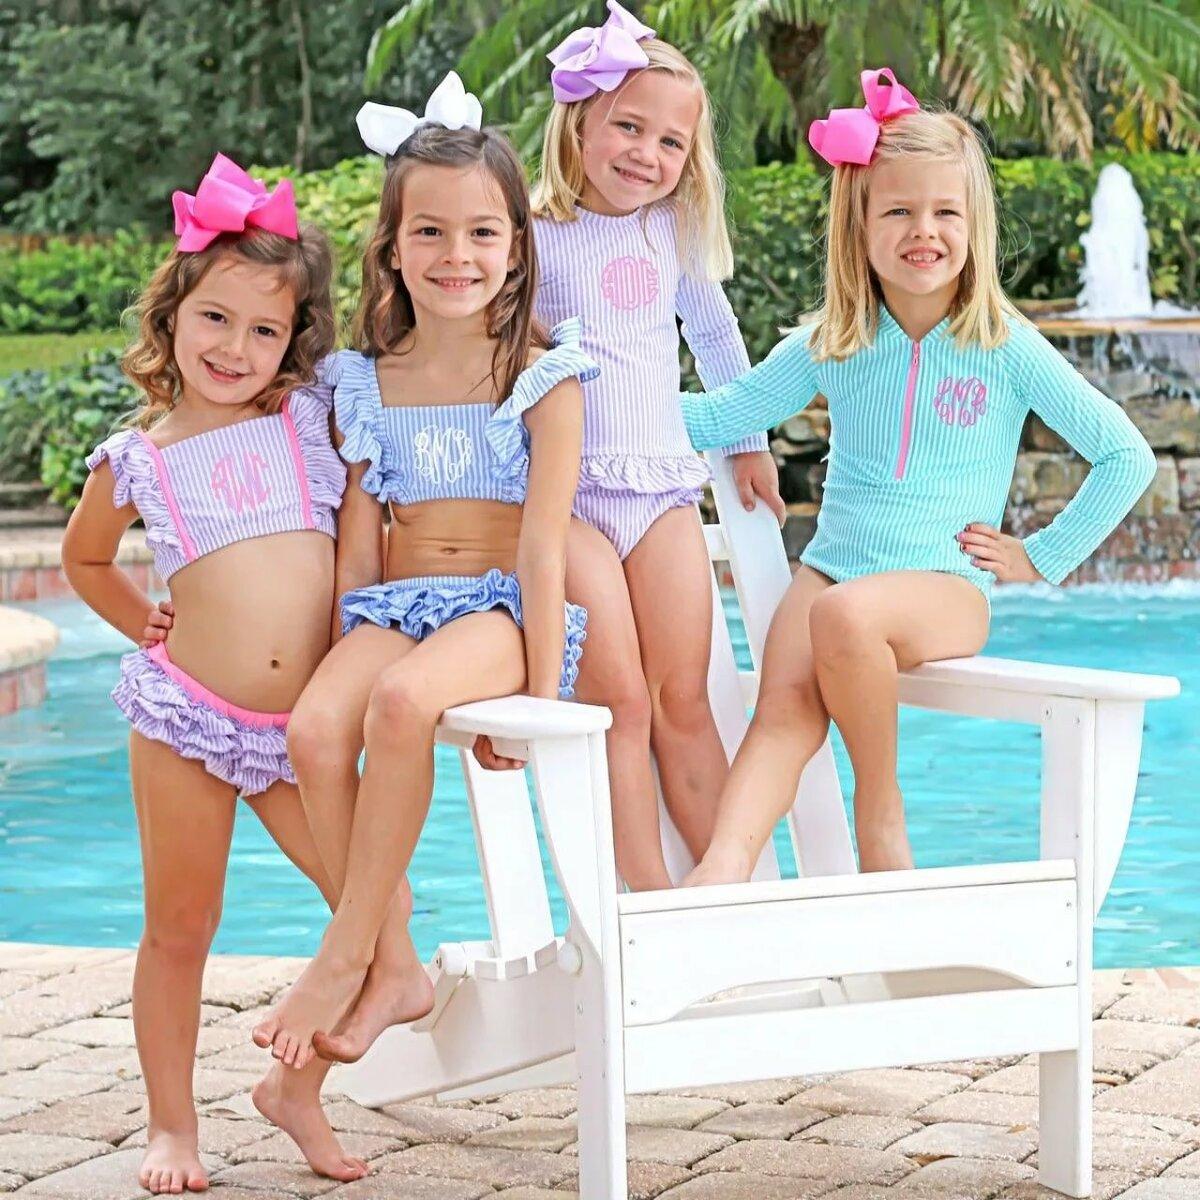 Bikini model school